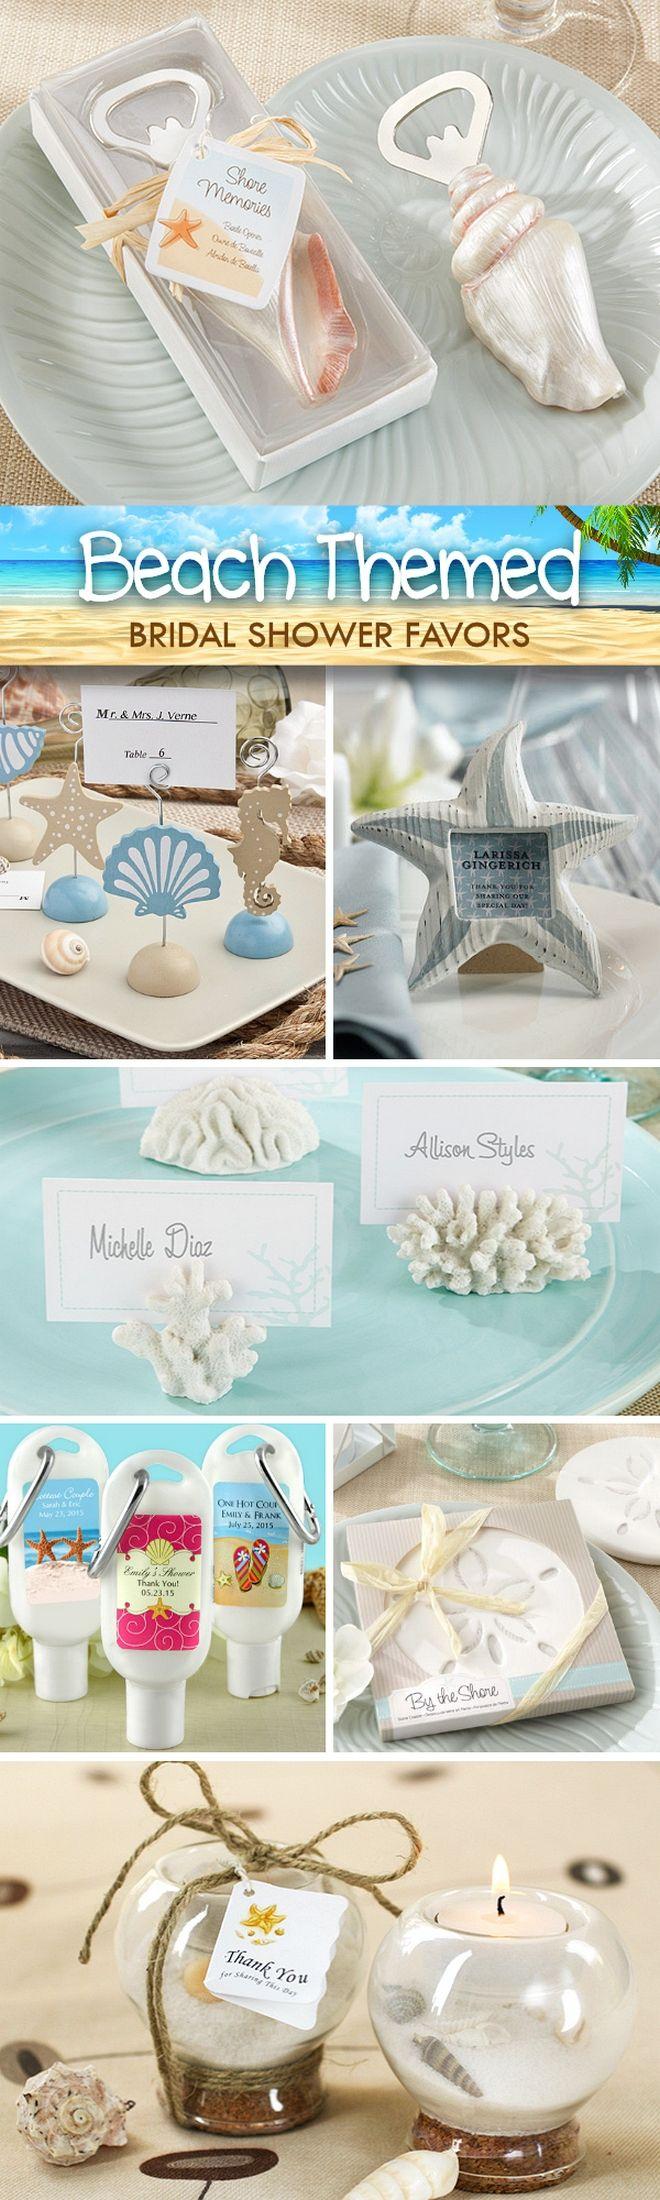 100+ Gorgeous Beach Themed Wedding Ideas and Accessories | Beach ...